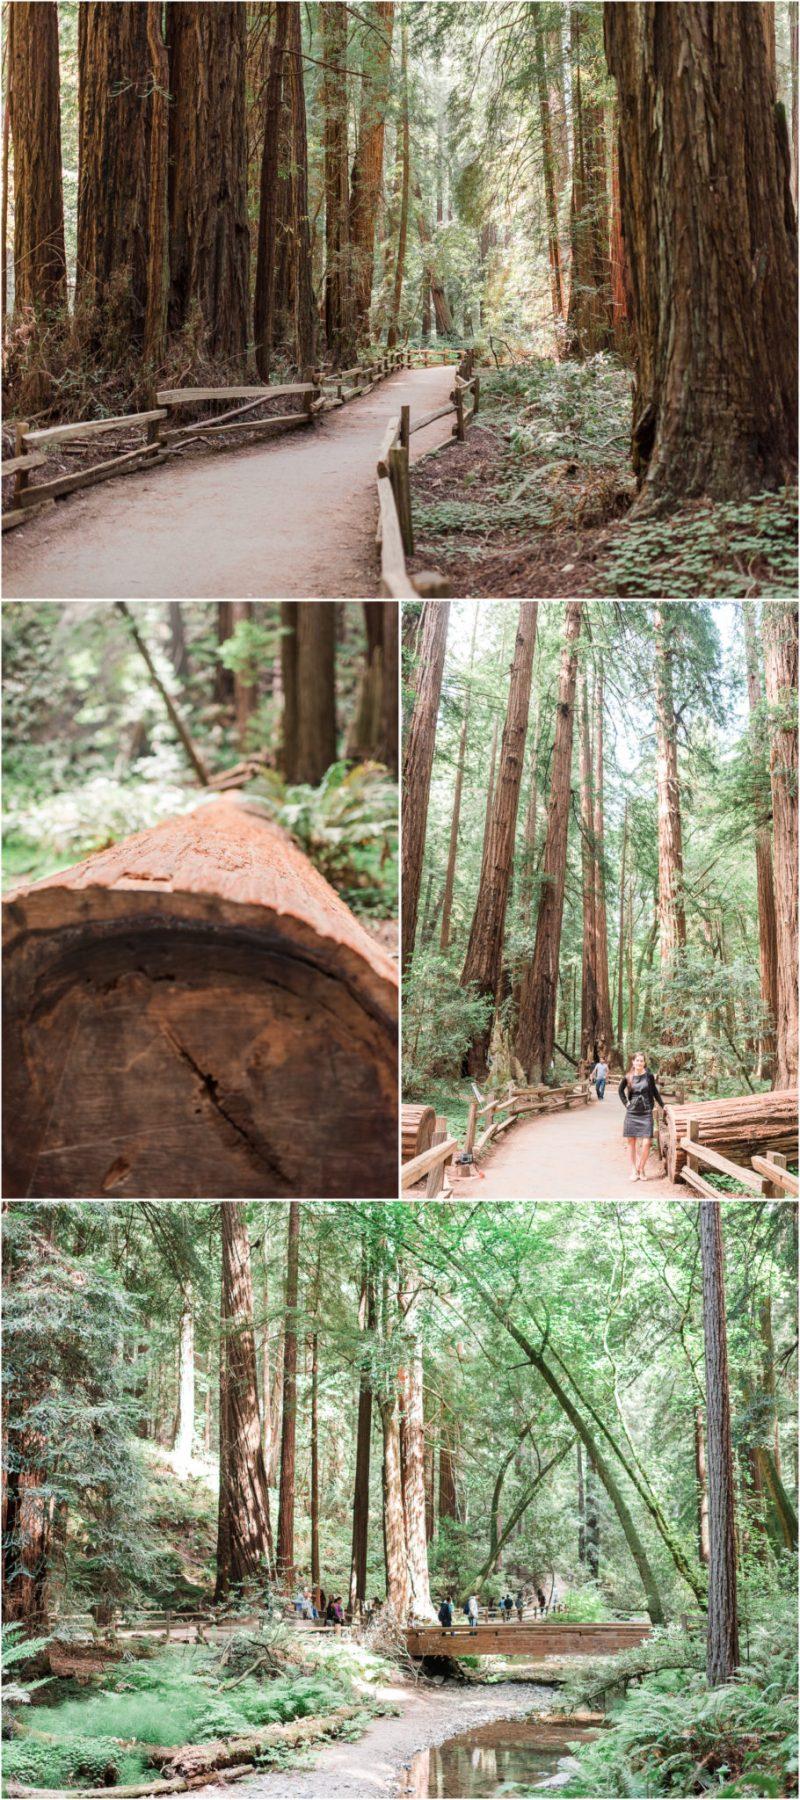 Muir Woods Redwoods in California